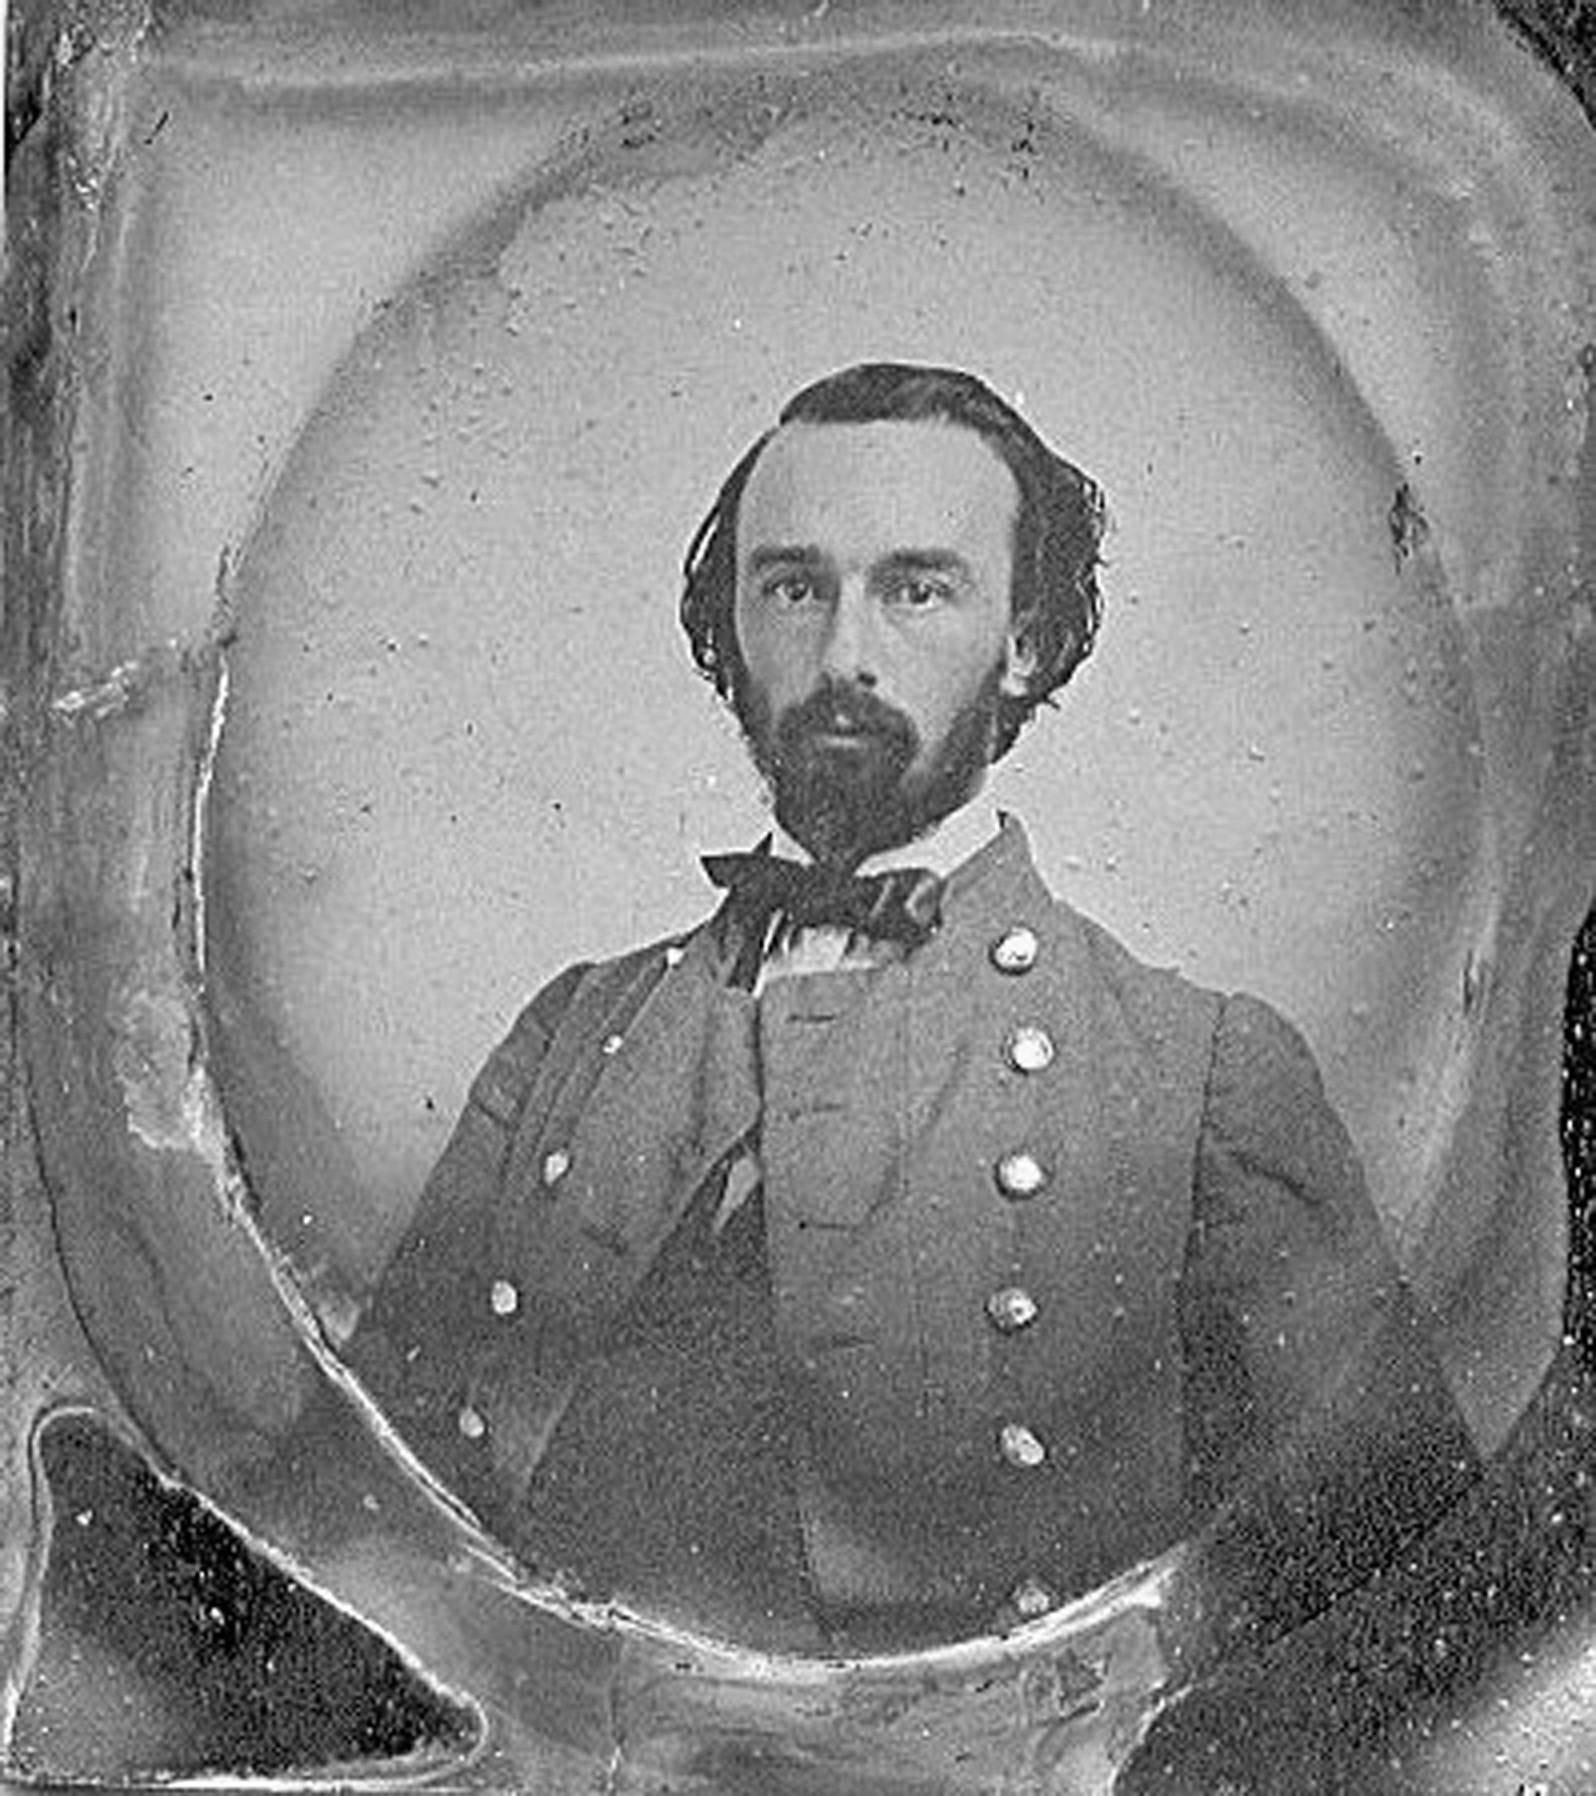 Captain George Reavis